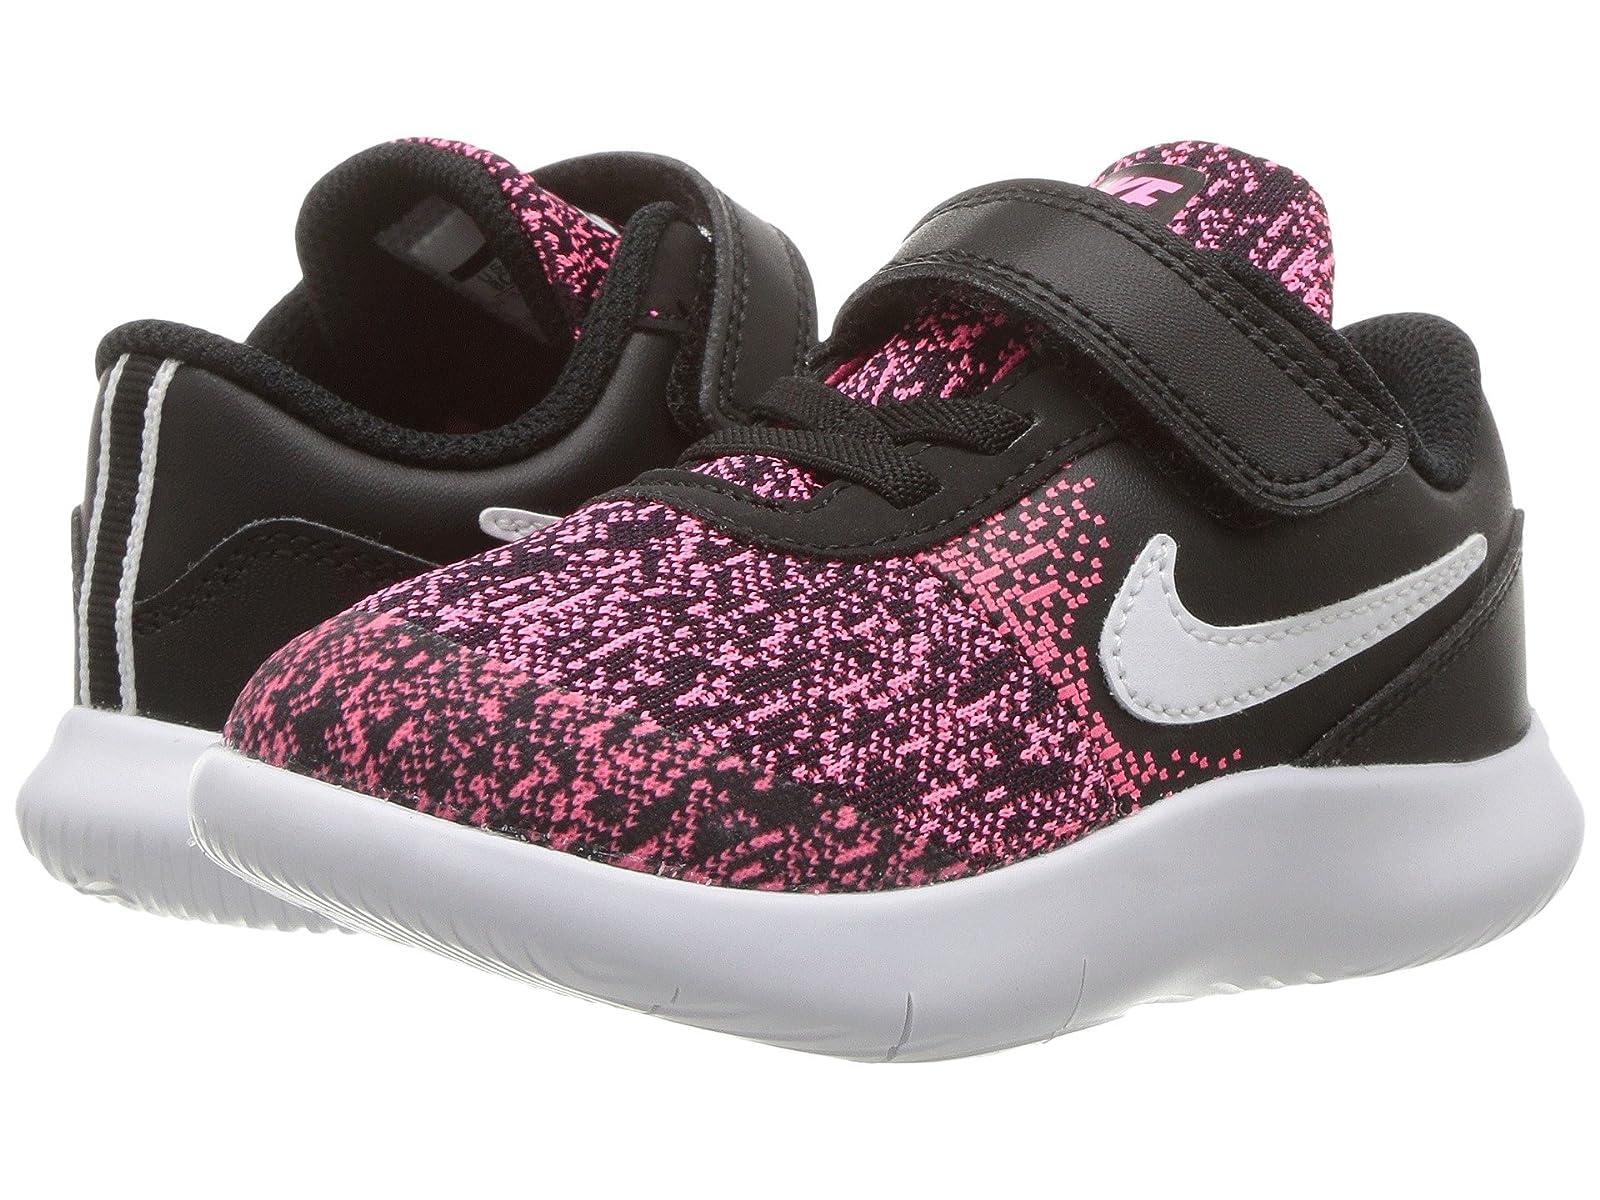 Nike Kids Flex Contact (Infant/Toddler)Atmospheric grades have affordable shoes